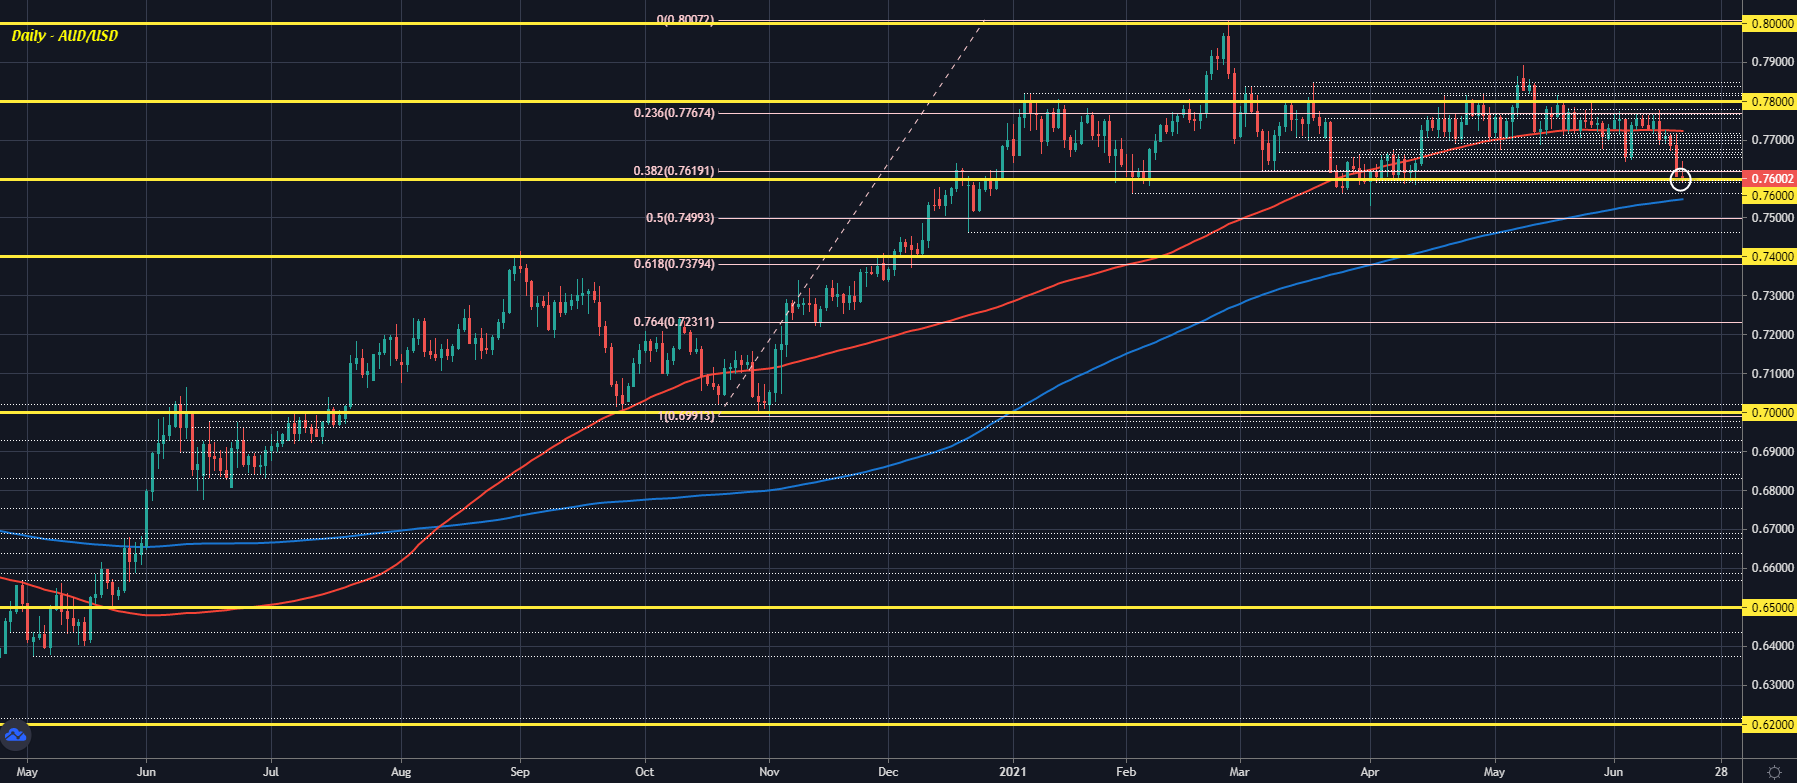 Dollar keeps post-FOMC advance in European morning trade so far